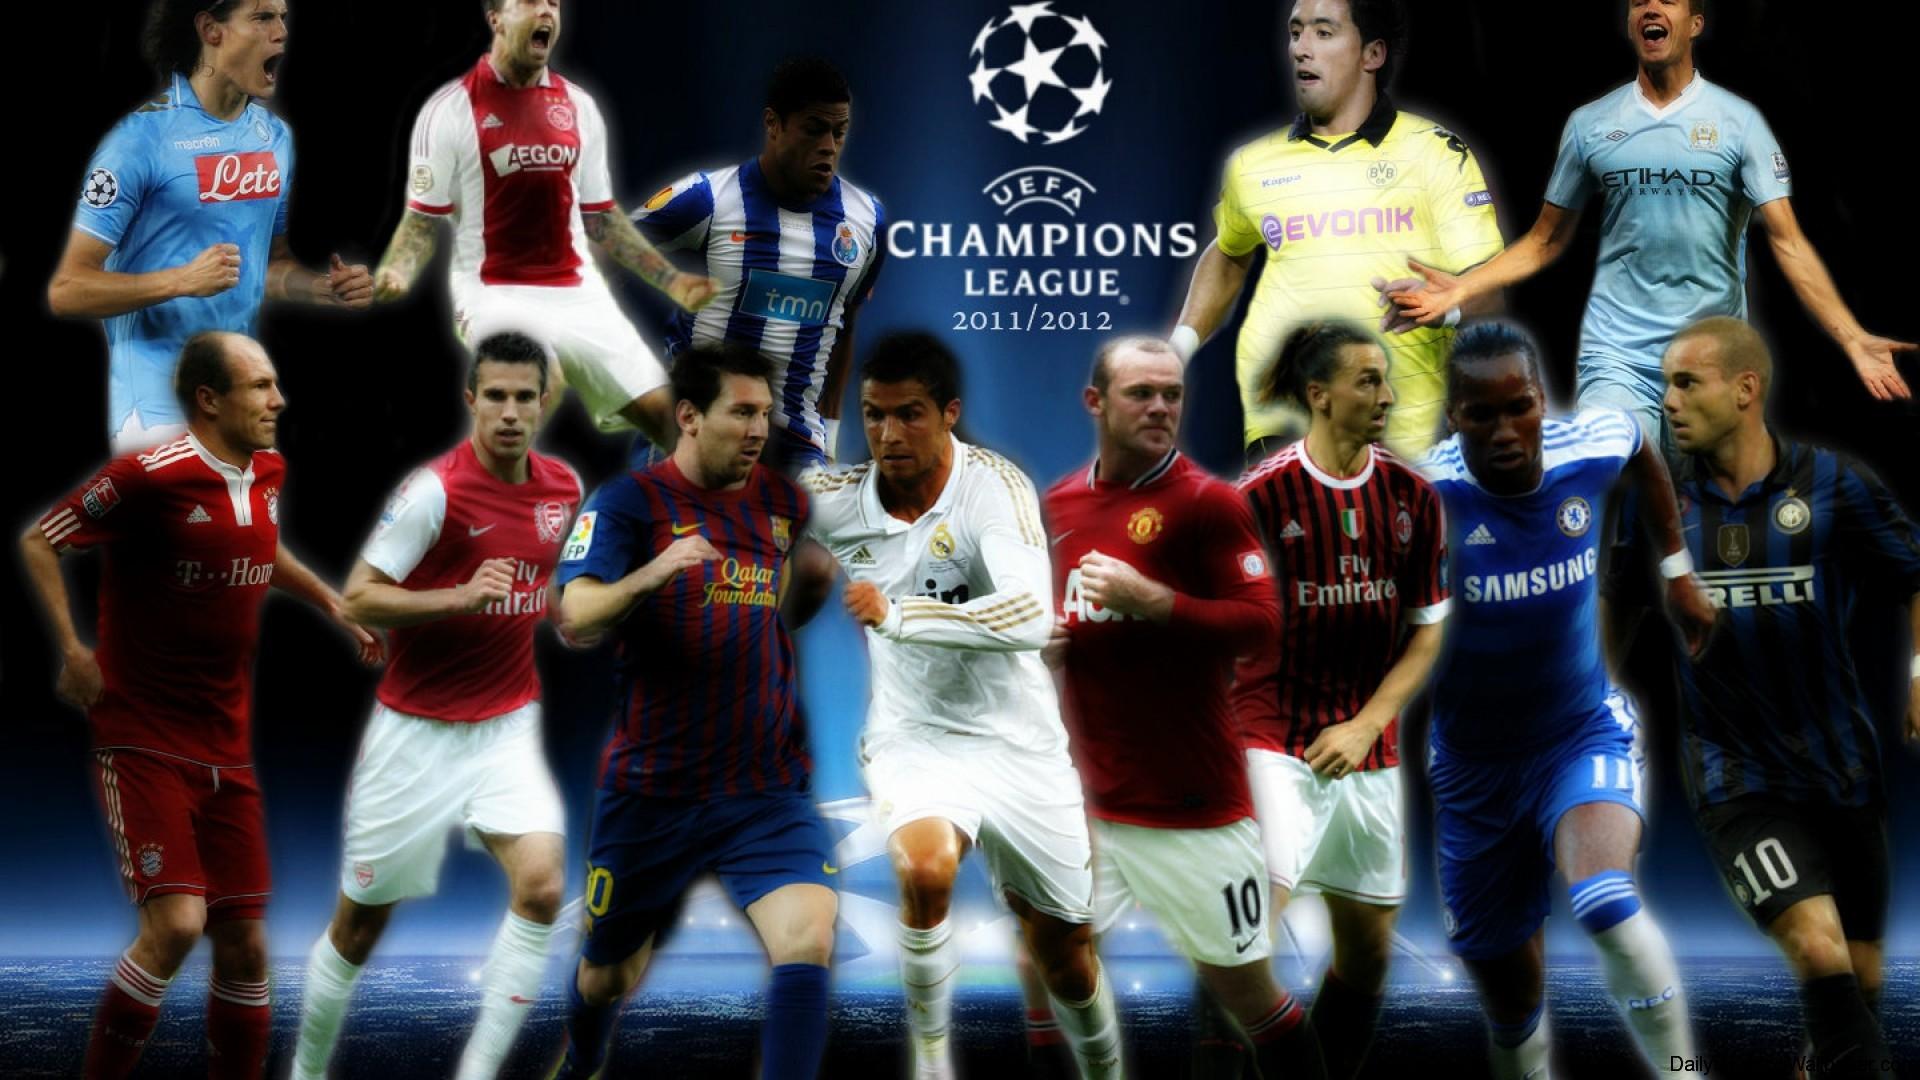 Champions League Wallpaper